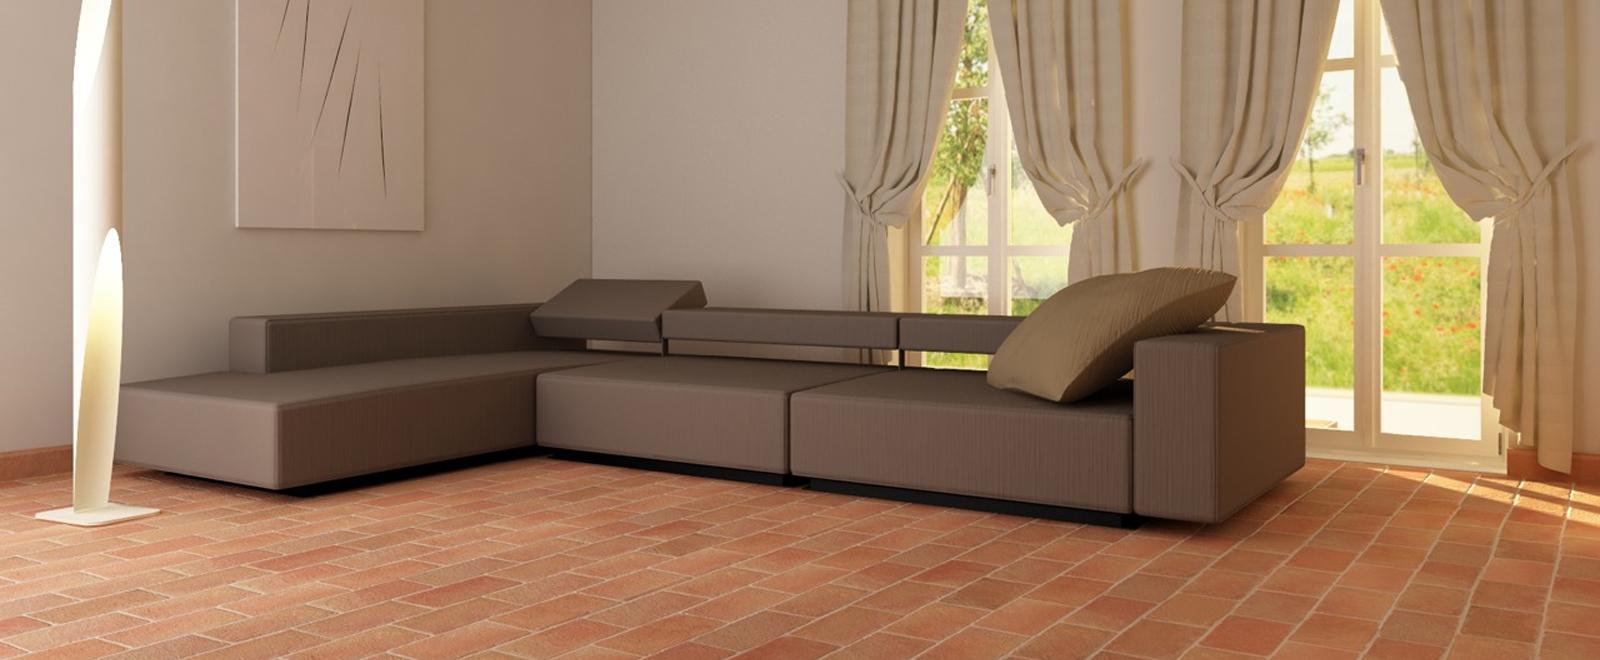 Camere da letto moderne chateau dax - Pavimenti per interni moderni ...